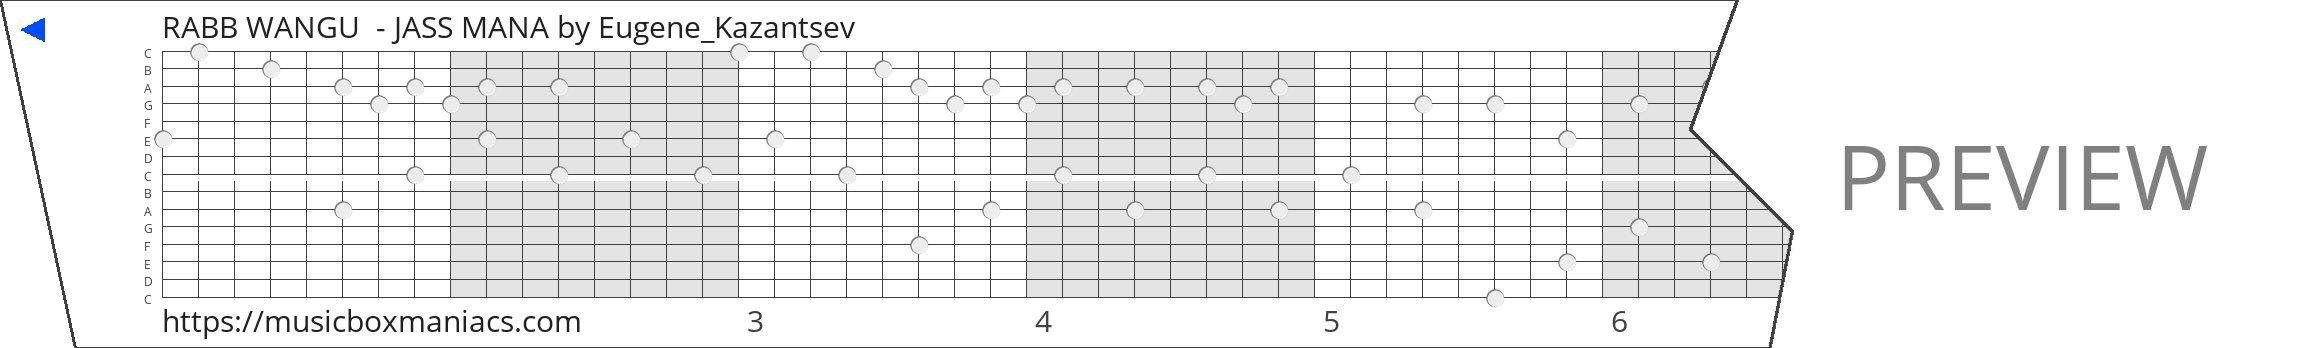 RABB WANGU  - JASS MANA 15 note music box paper strip